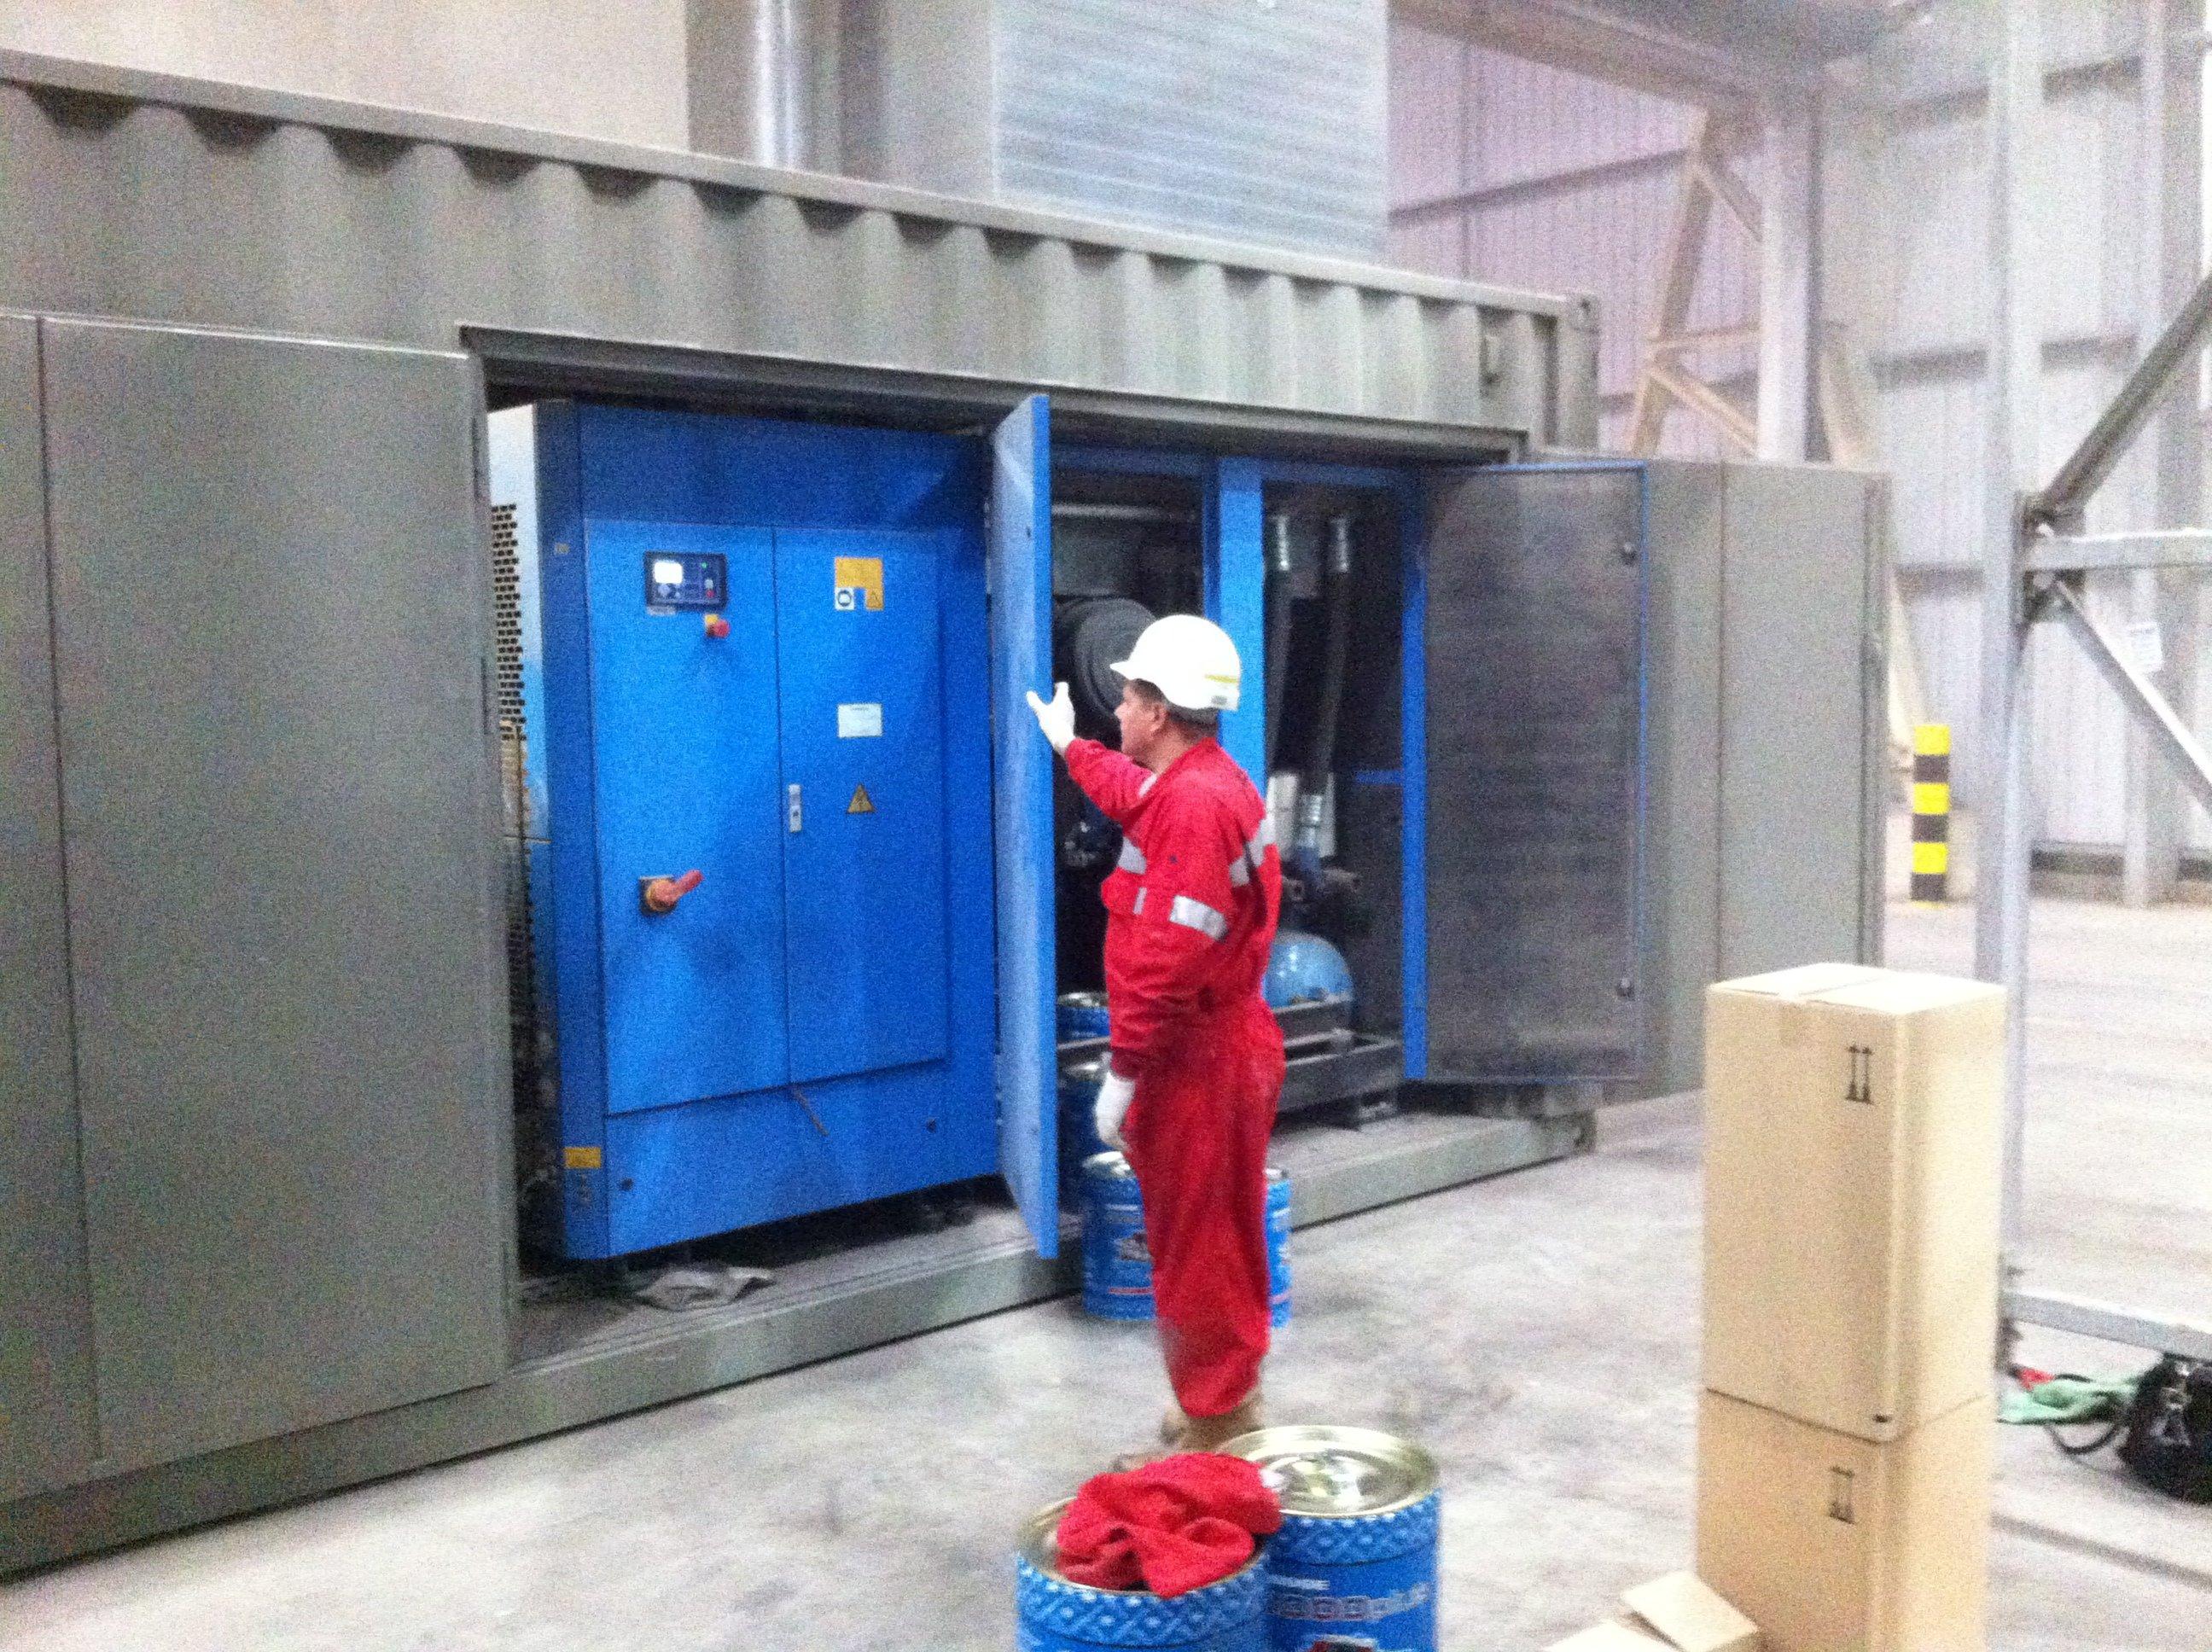 Compressor leak detection